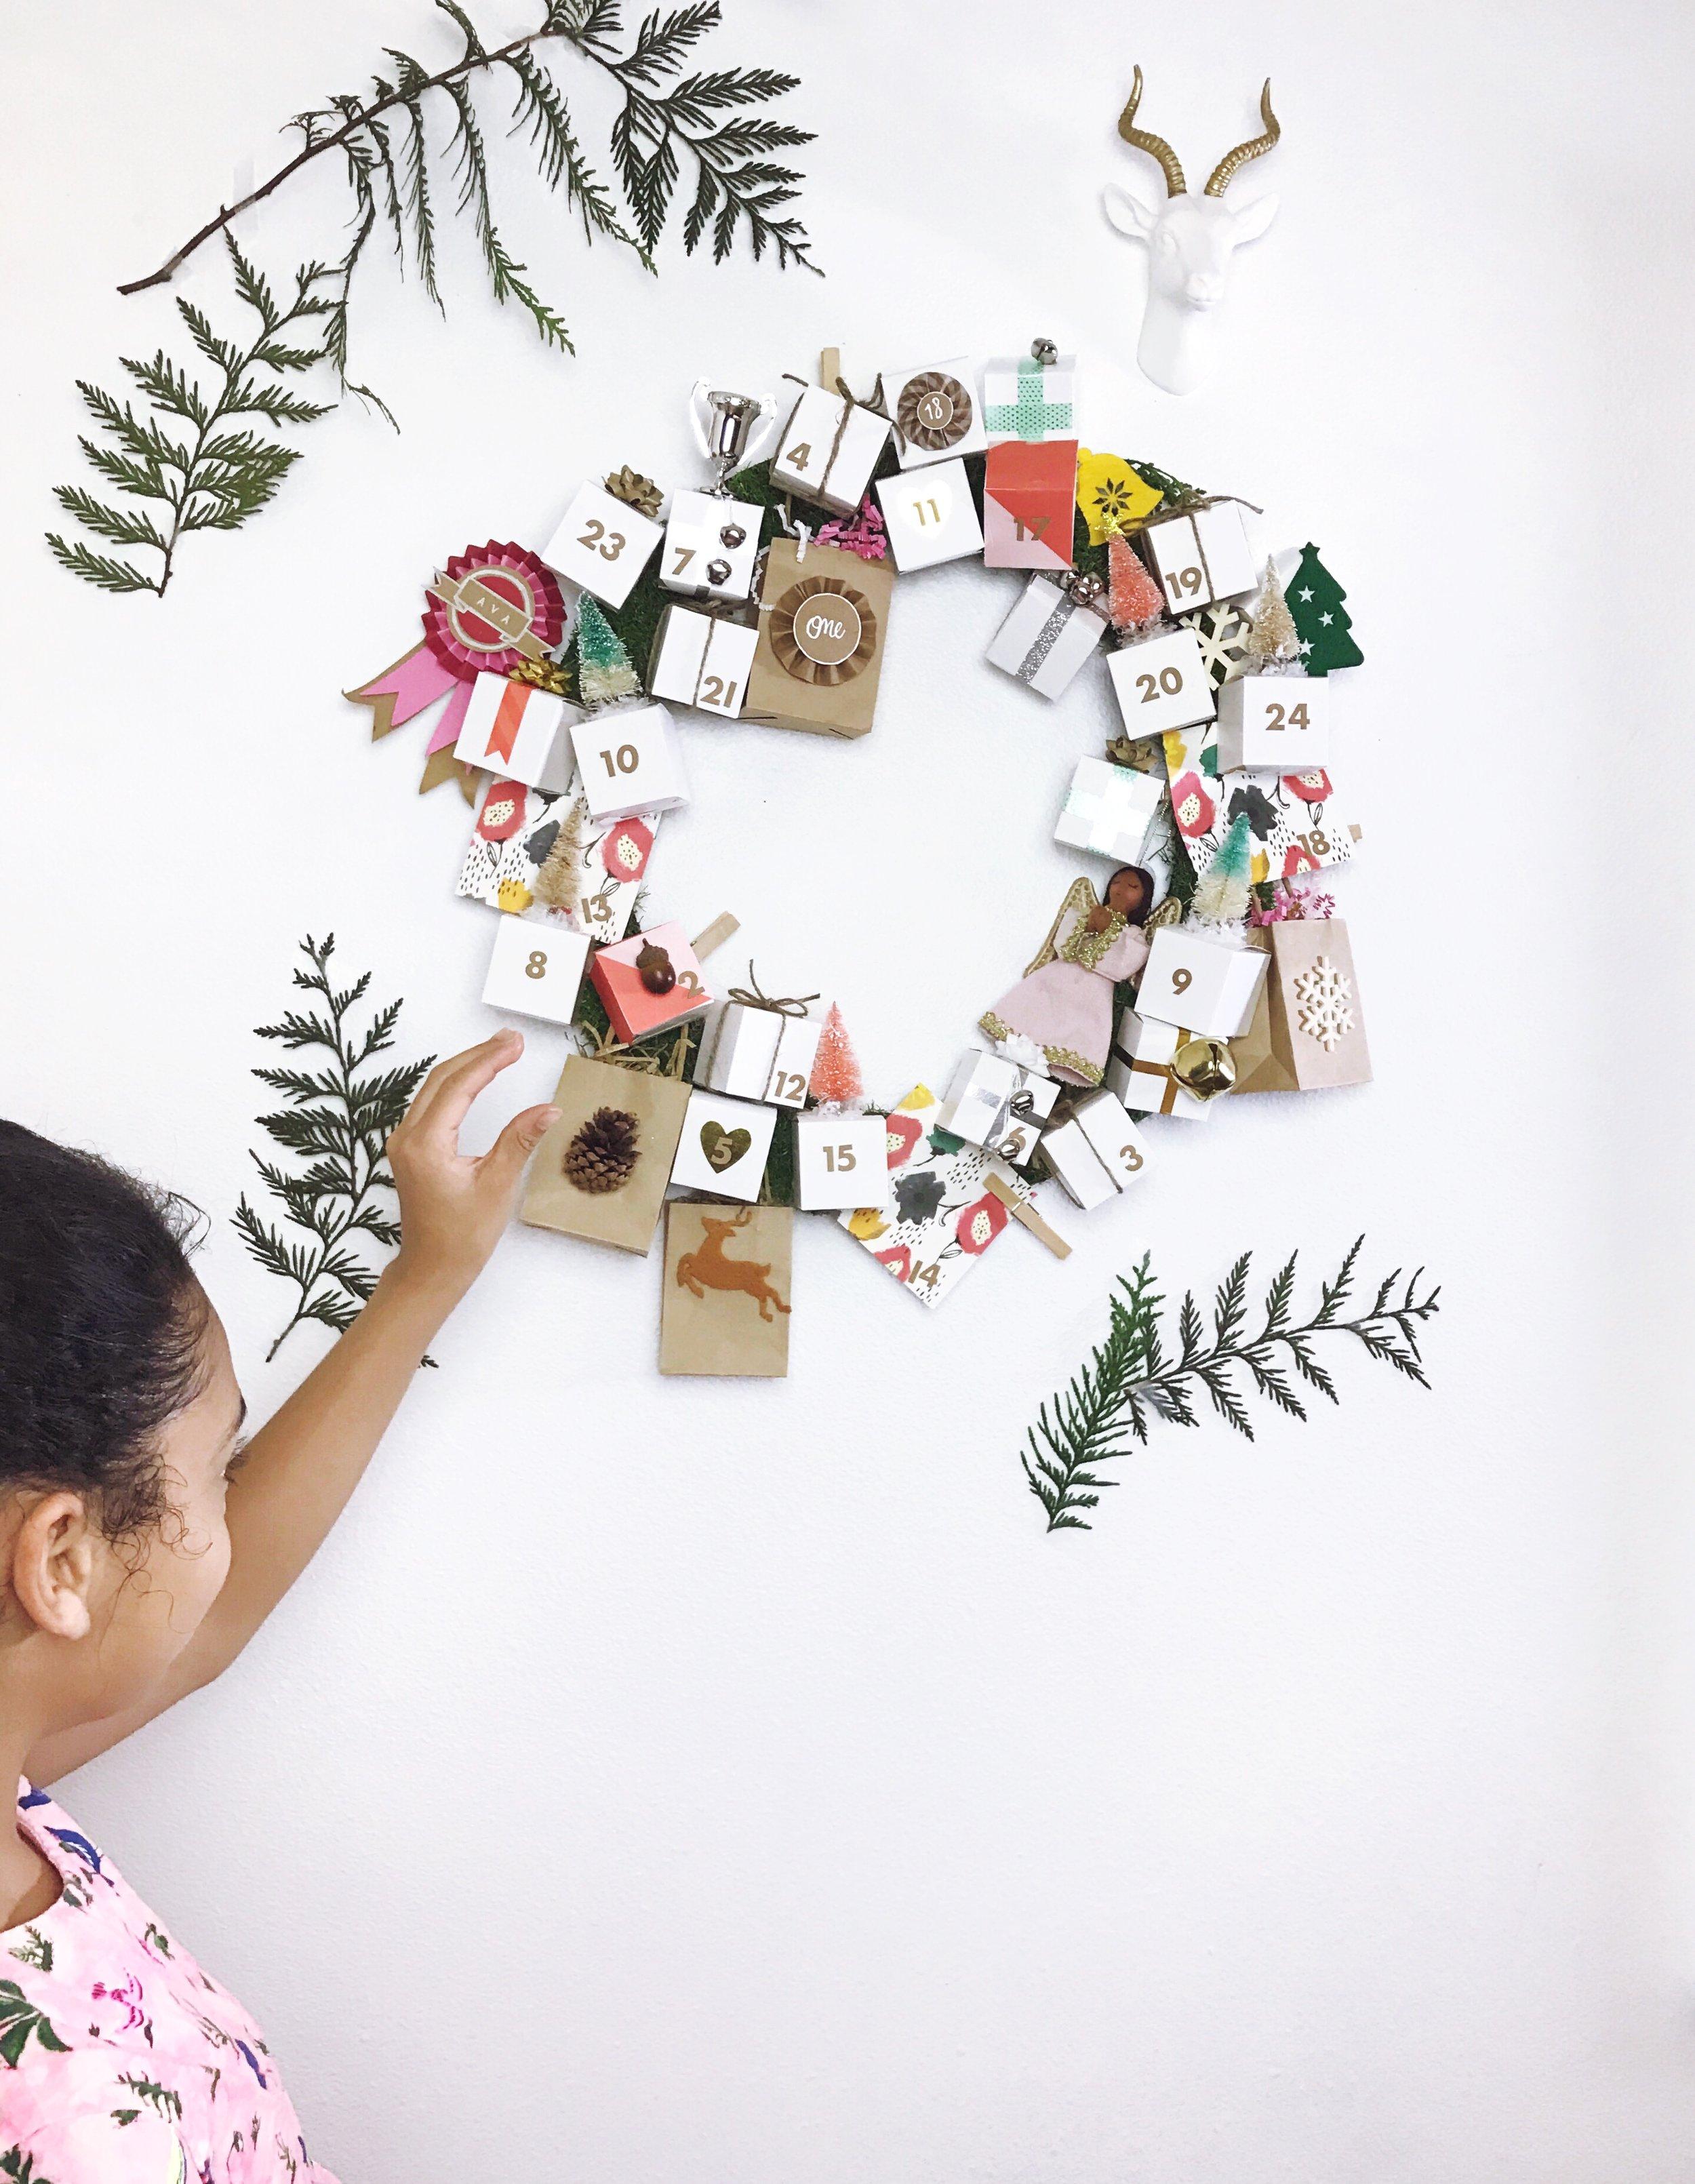 Original_Marabou-Design-Advent-Calendar-Beauty-2.JPG